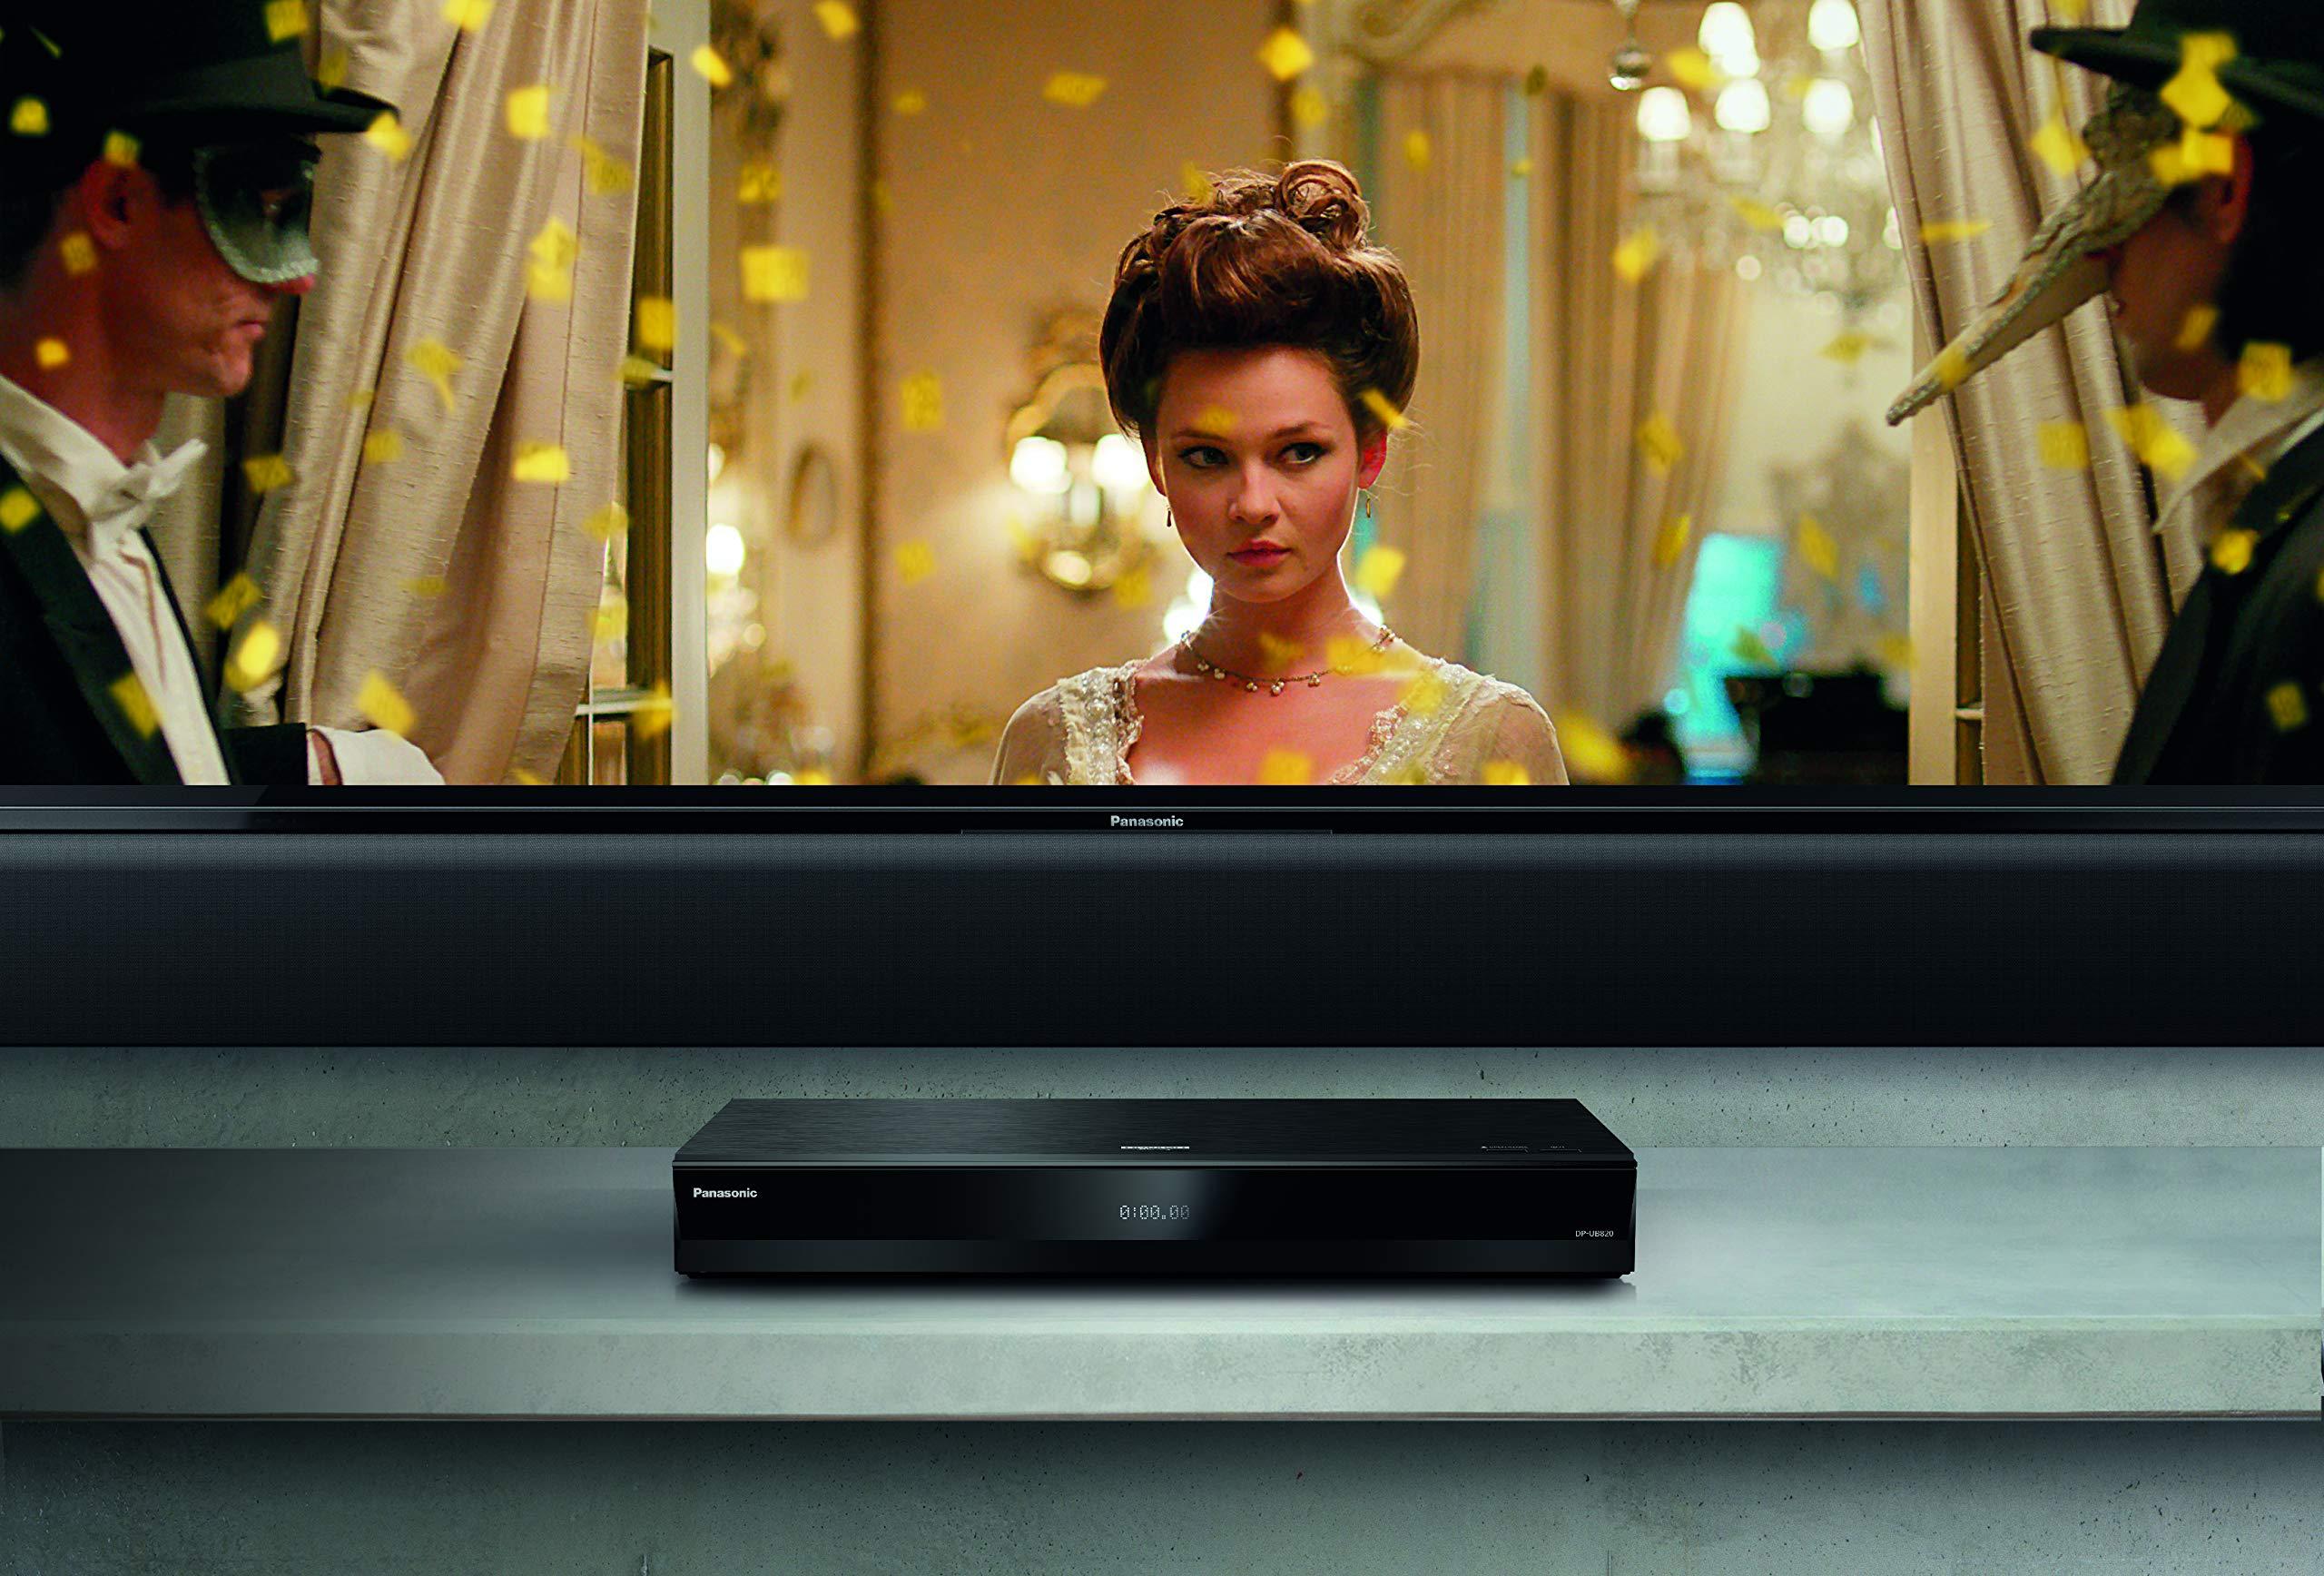 81jPyn5kmjL - Panasonic DP-UB820EB-K Ultra HD Blu-Ray Player - Black